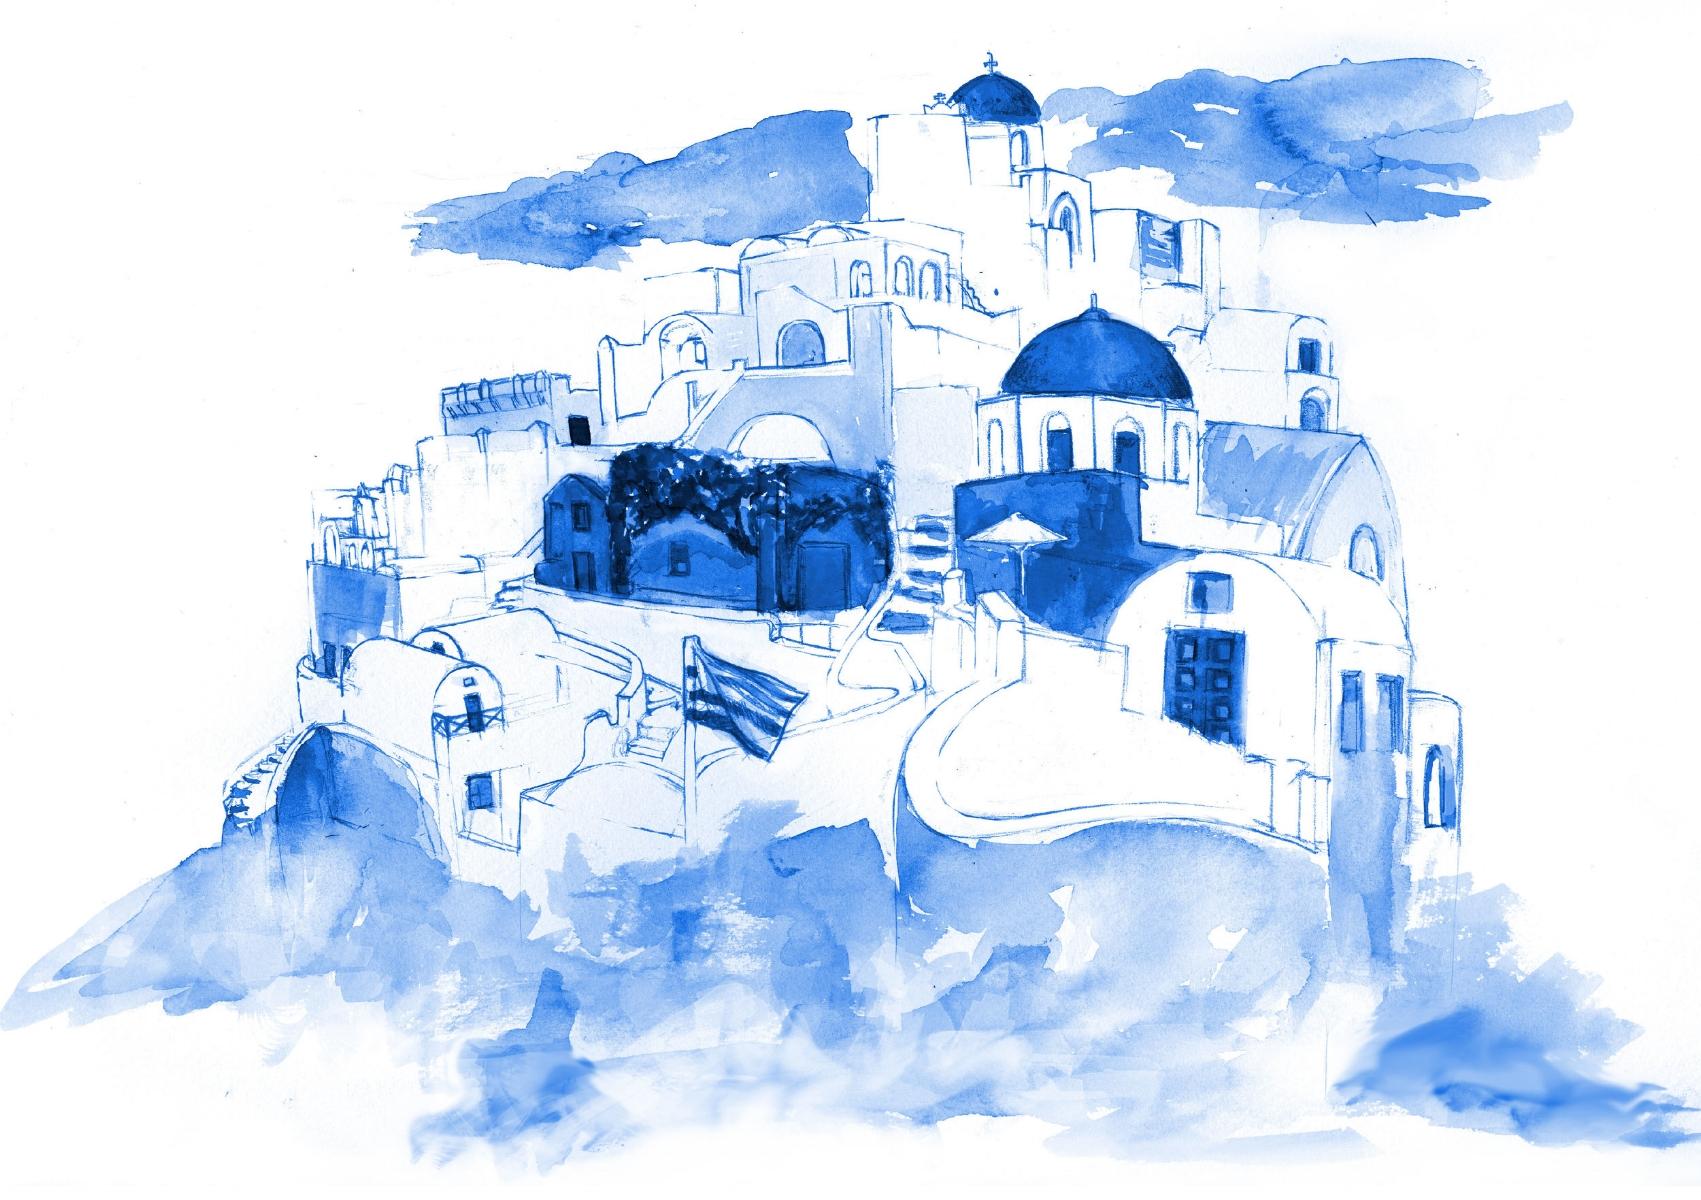 santorini cityscape monochrome.jpg